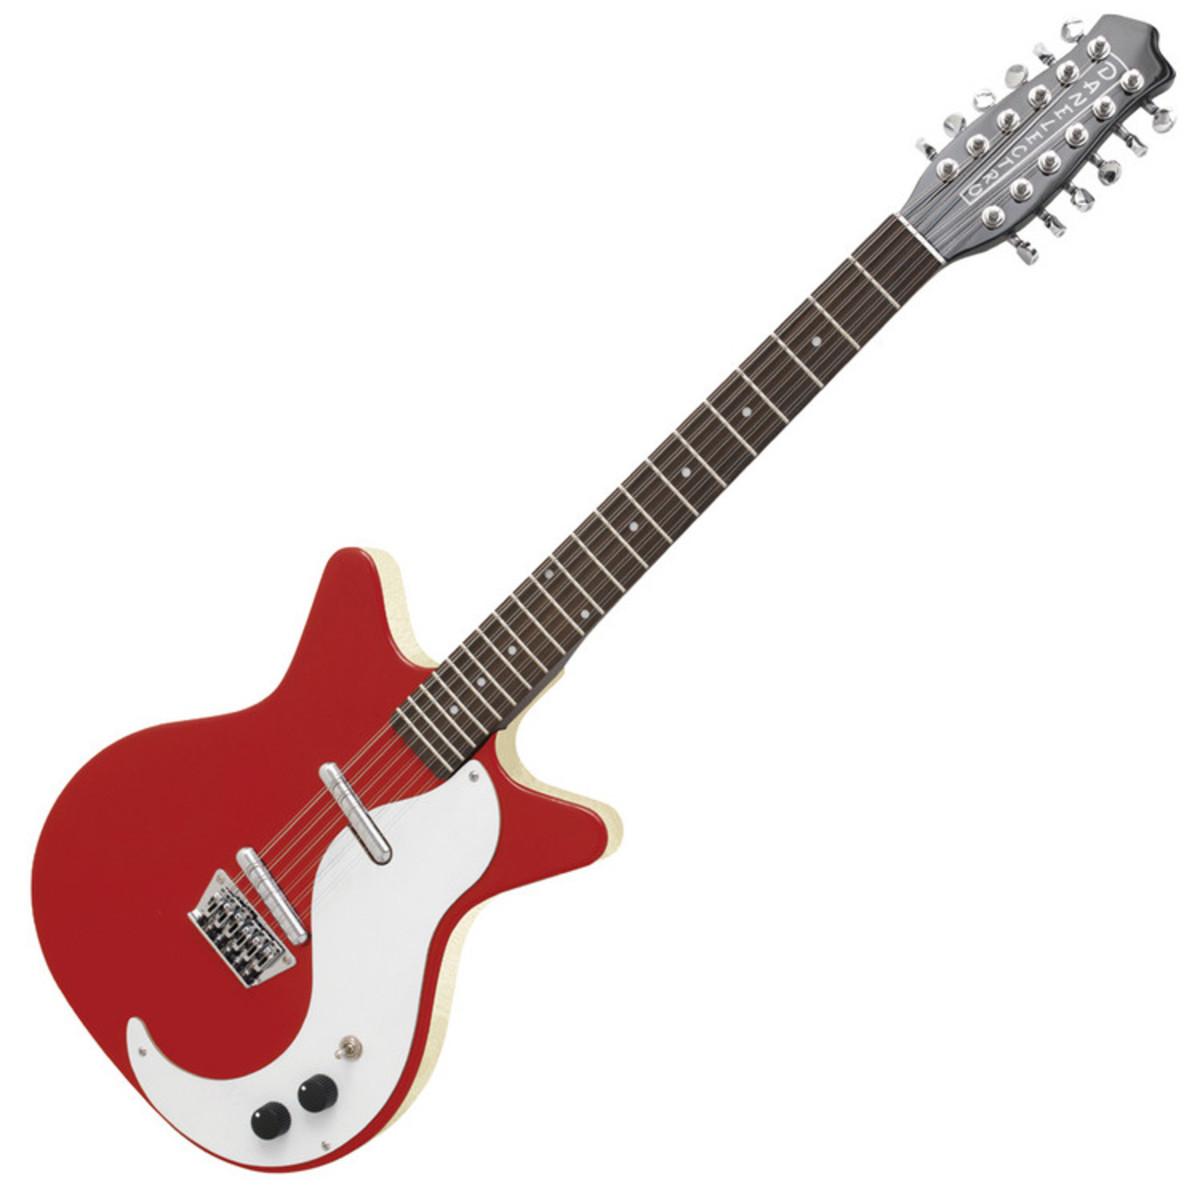 danelectro dc59 12 string guitar red at gear4music. Black Bedroom Furniture Sets. Home Design Ideas